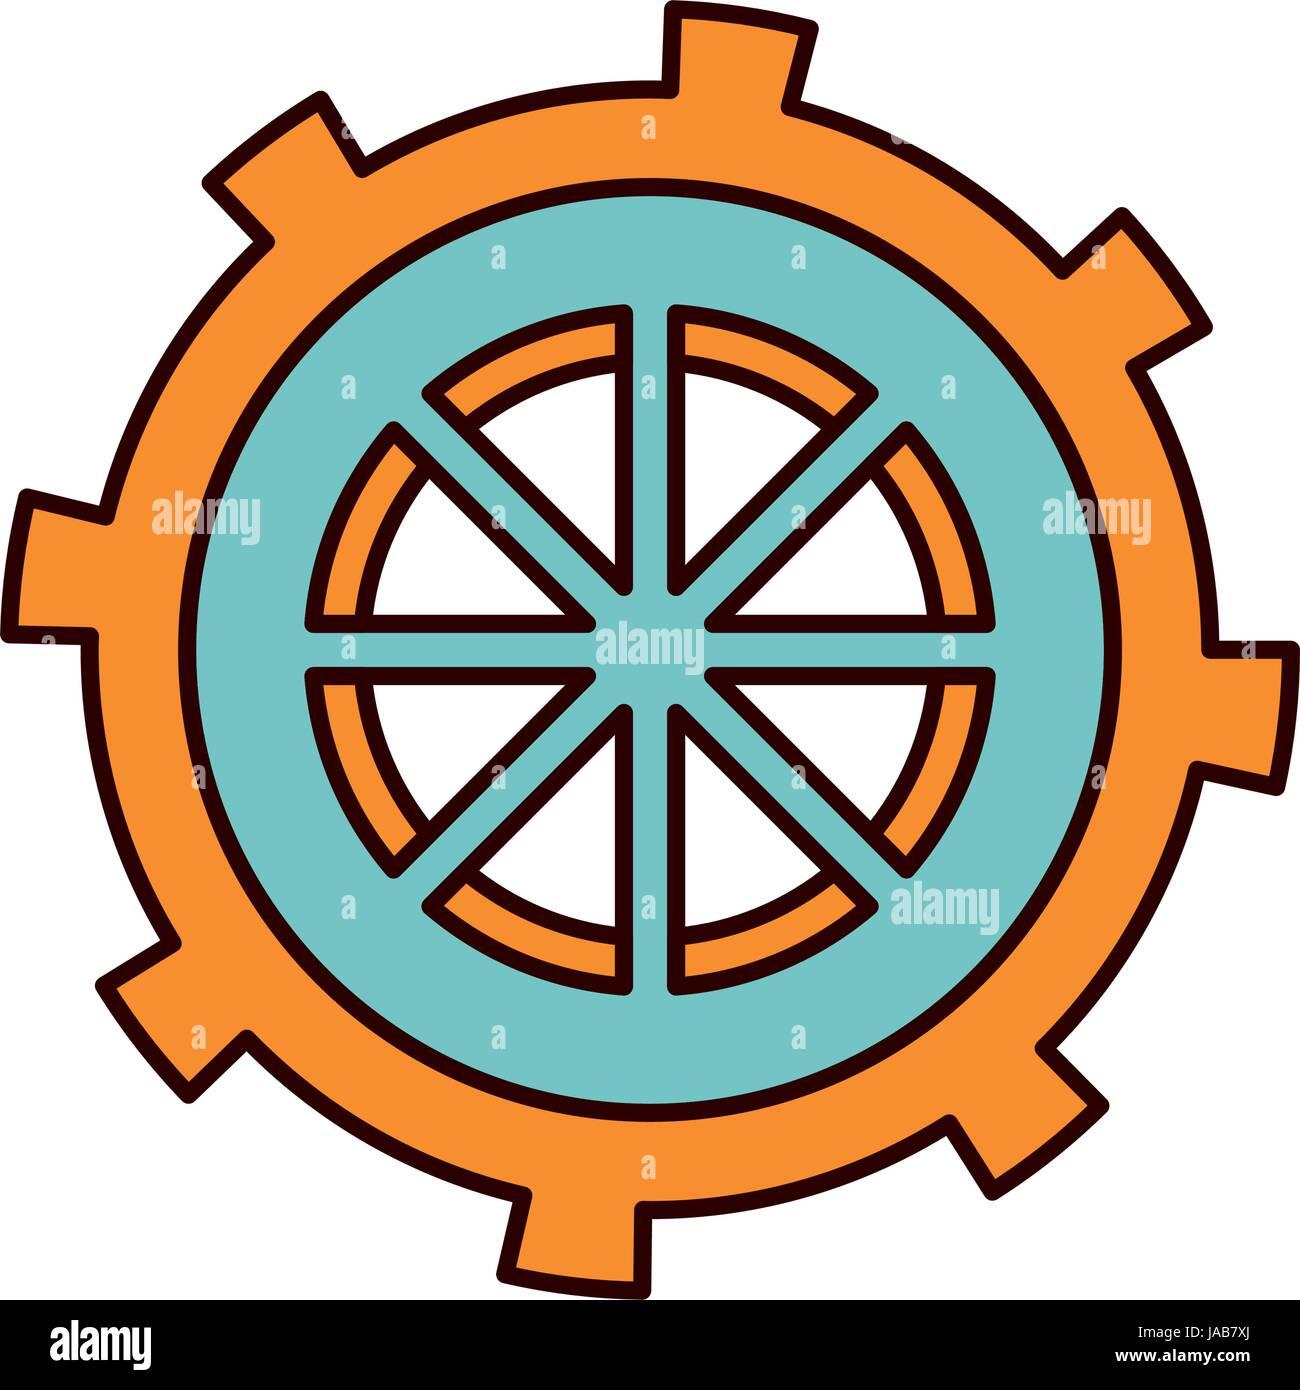 Color Sketch Silhouette Gear Wheel In Shape Boat Helm Stock Vector